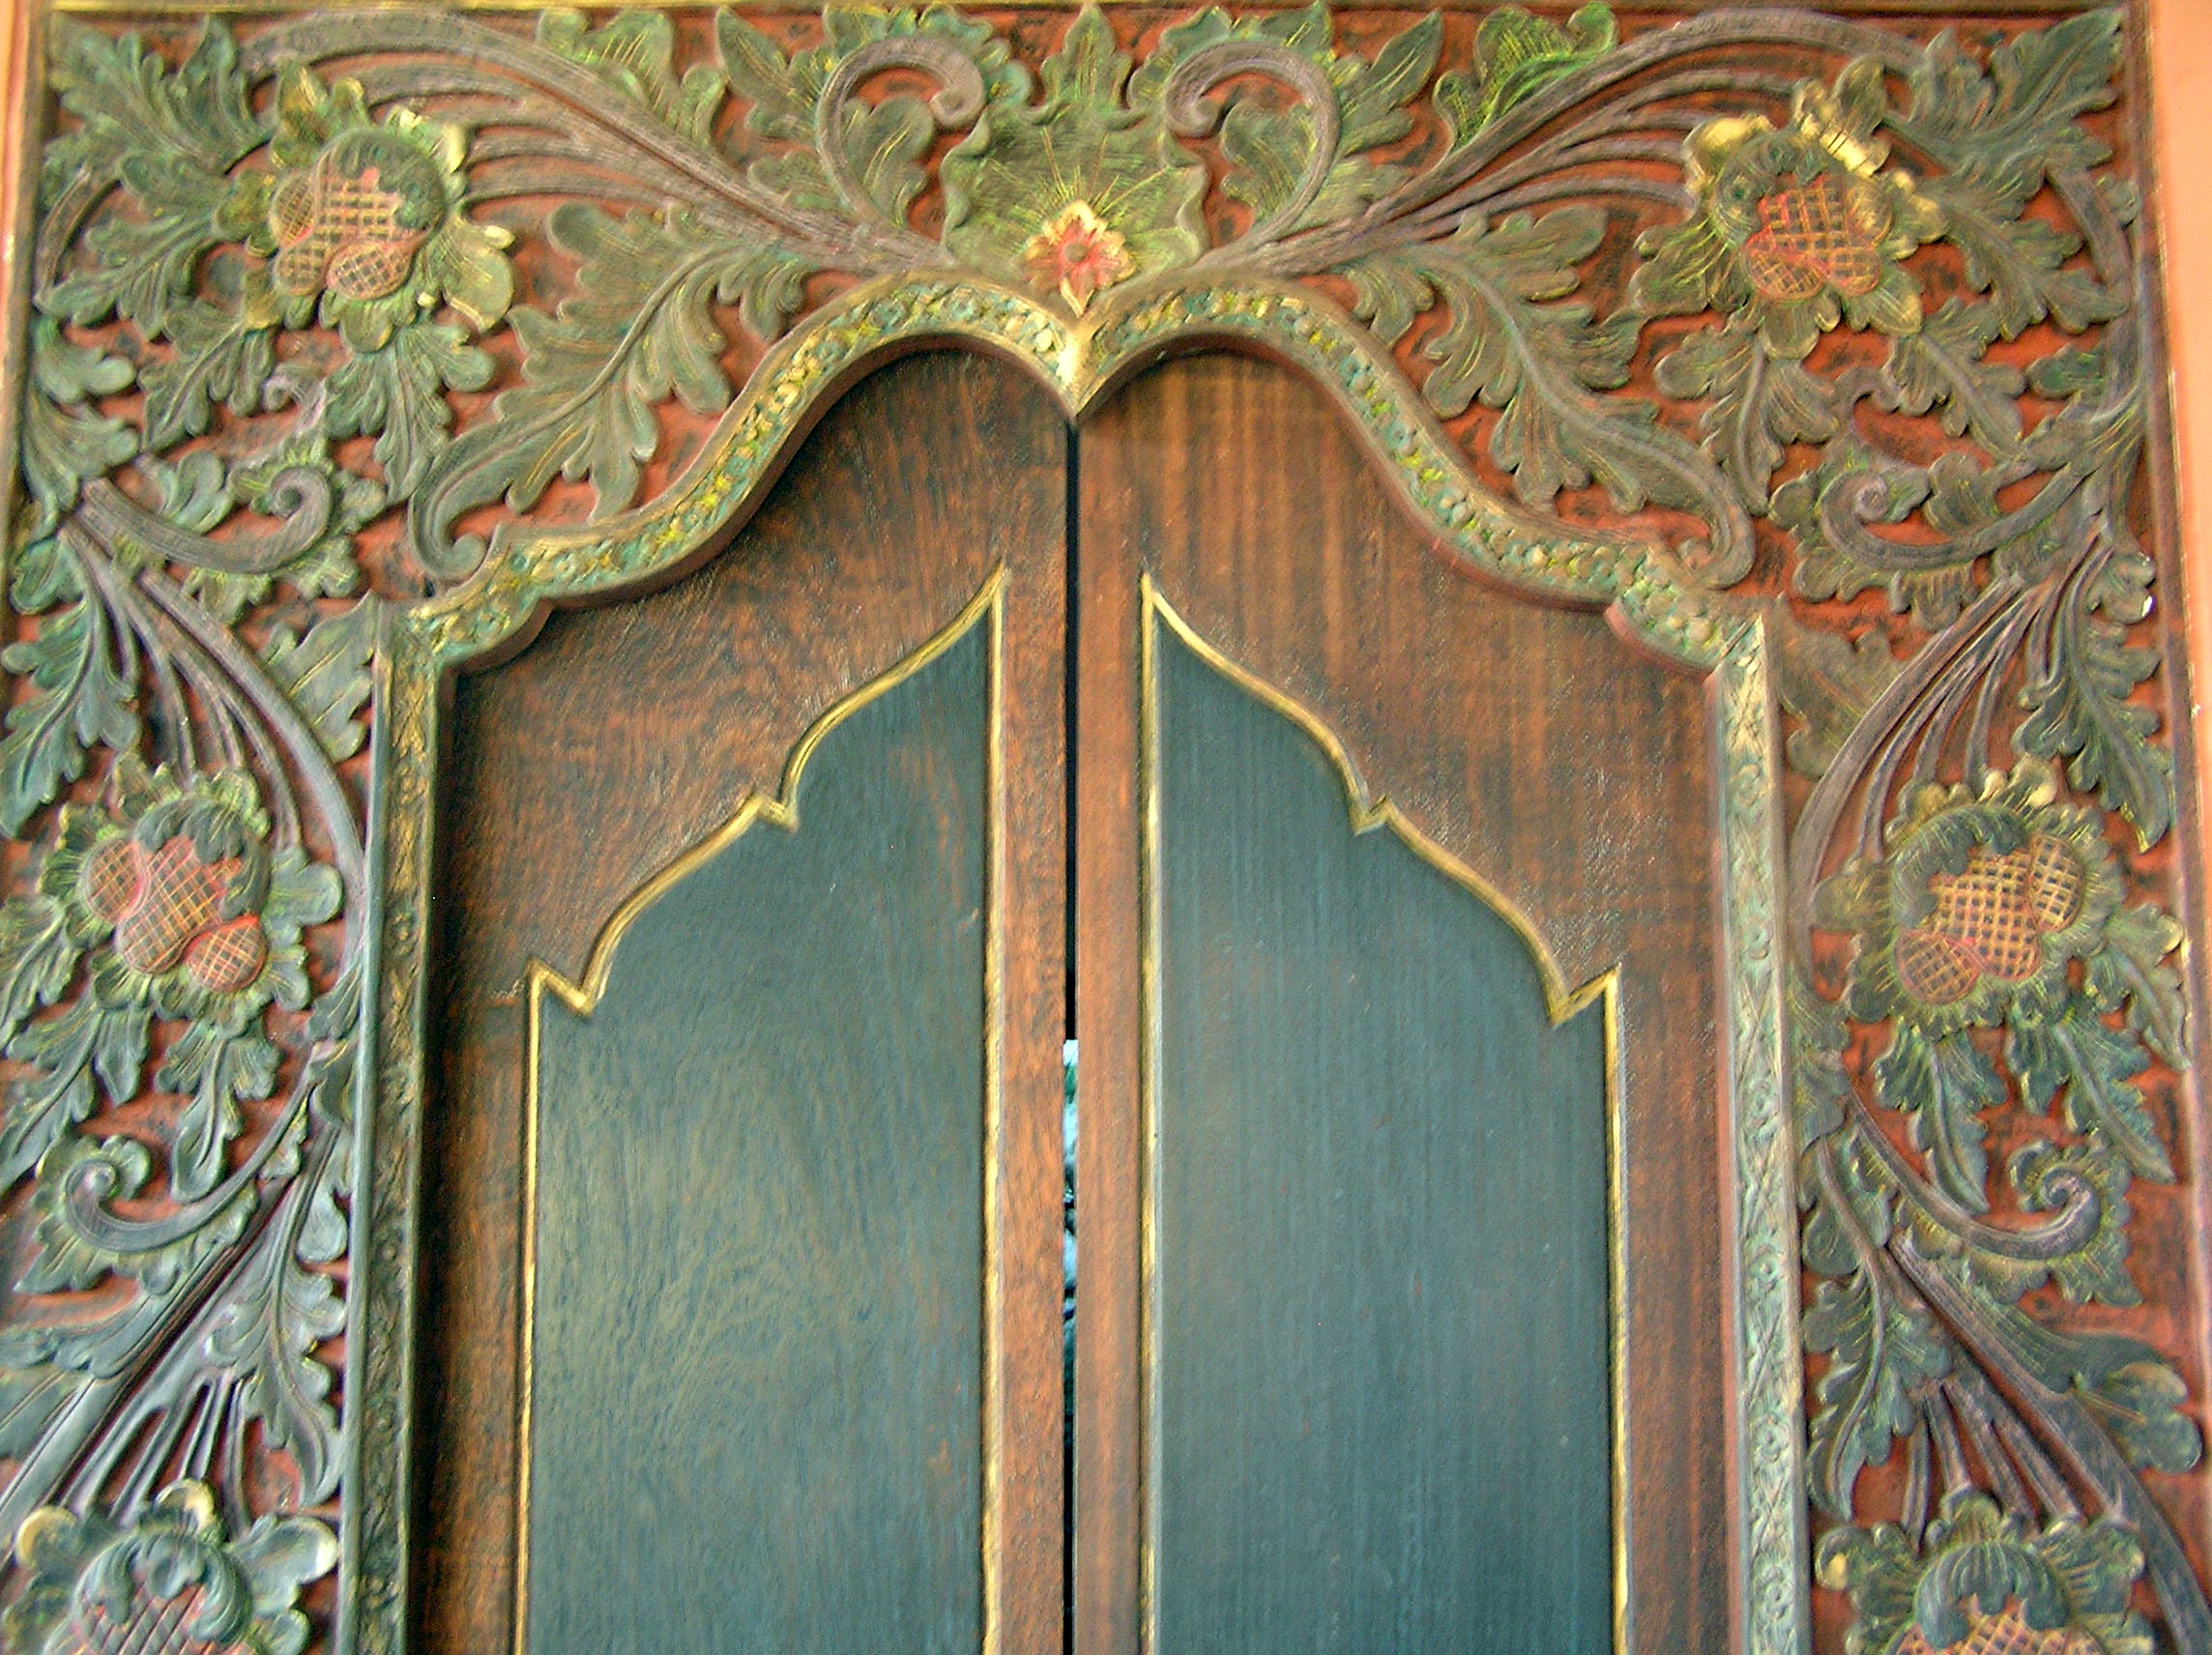 Bali Bedroom door at The Longhouse Jimbaran - Bali & Open Sesame! Balinese Doors | Compare Shops